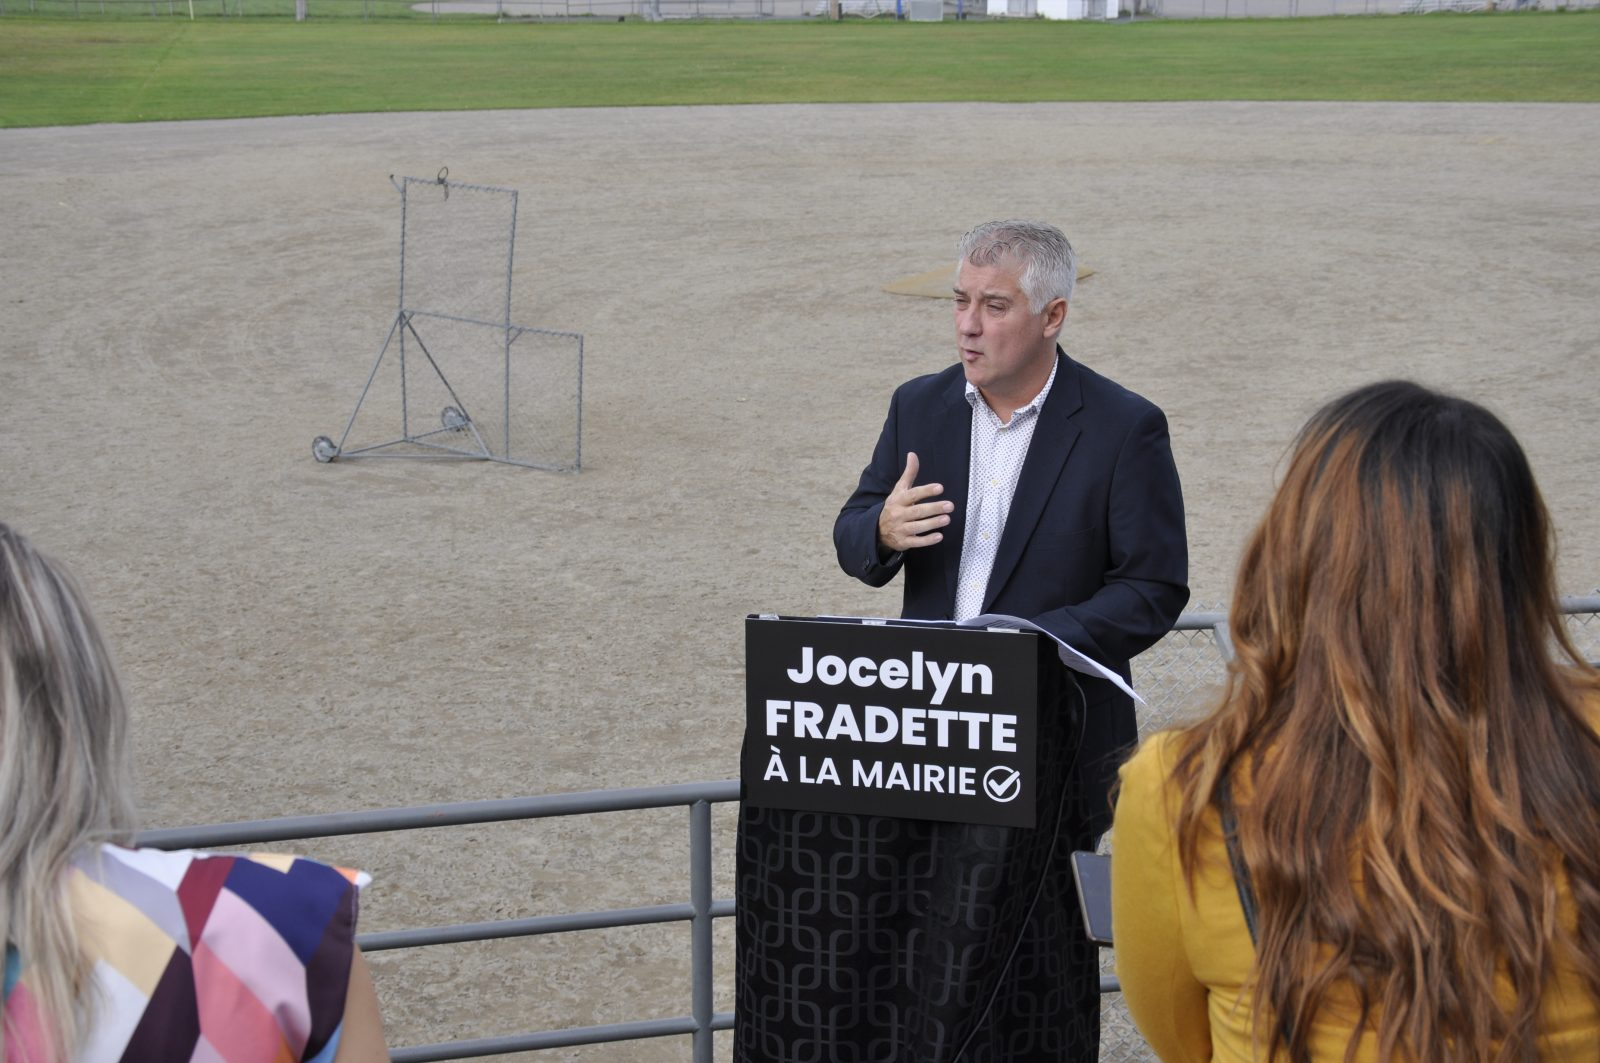 Terrains de baseball : Jocelyn Fradette veut qu'Alma rattrape son retard